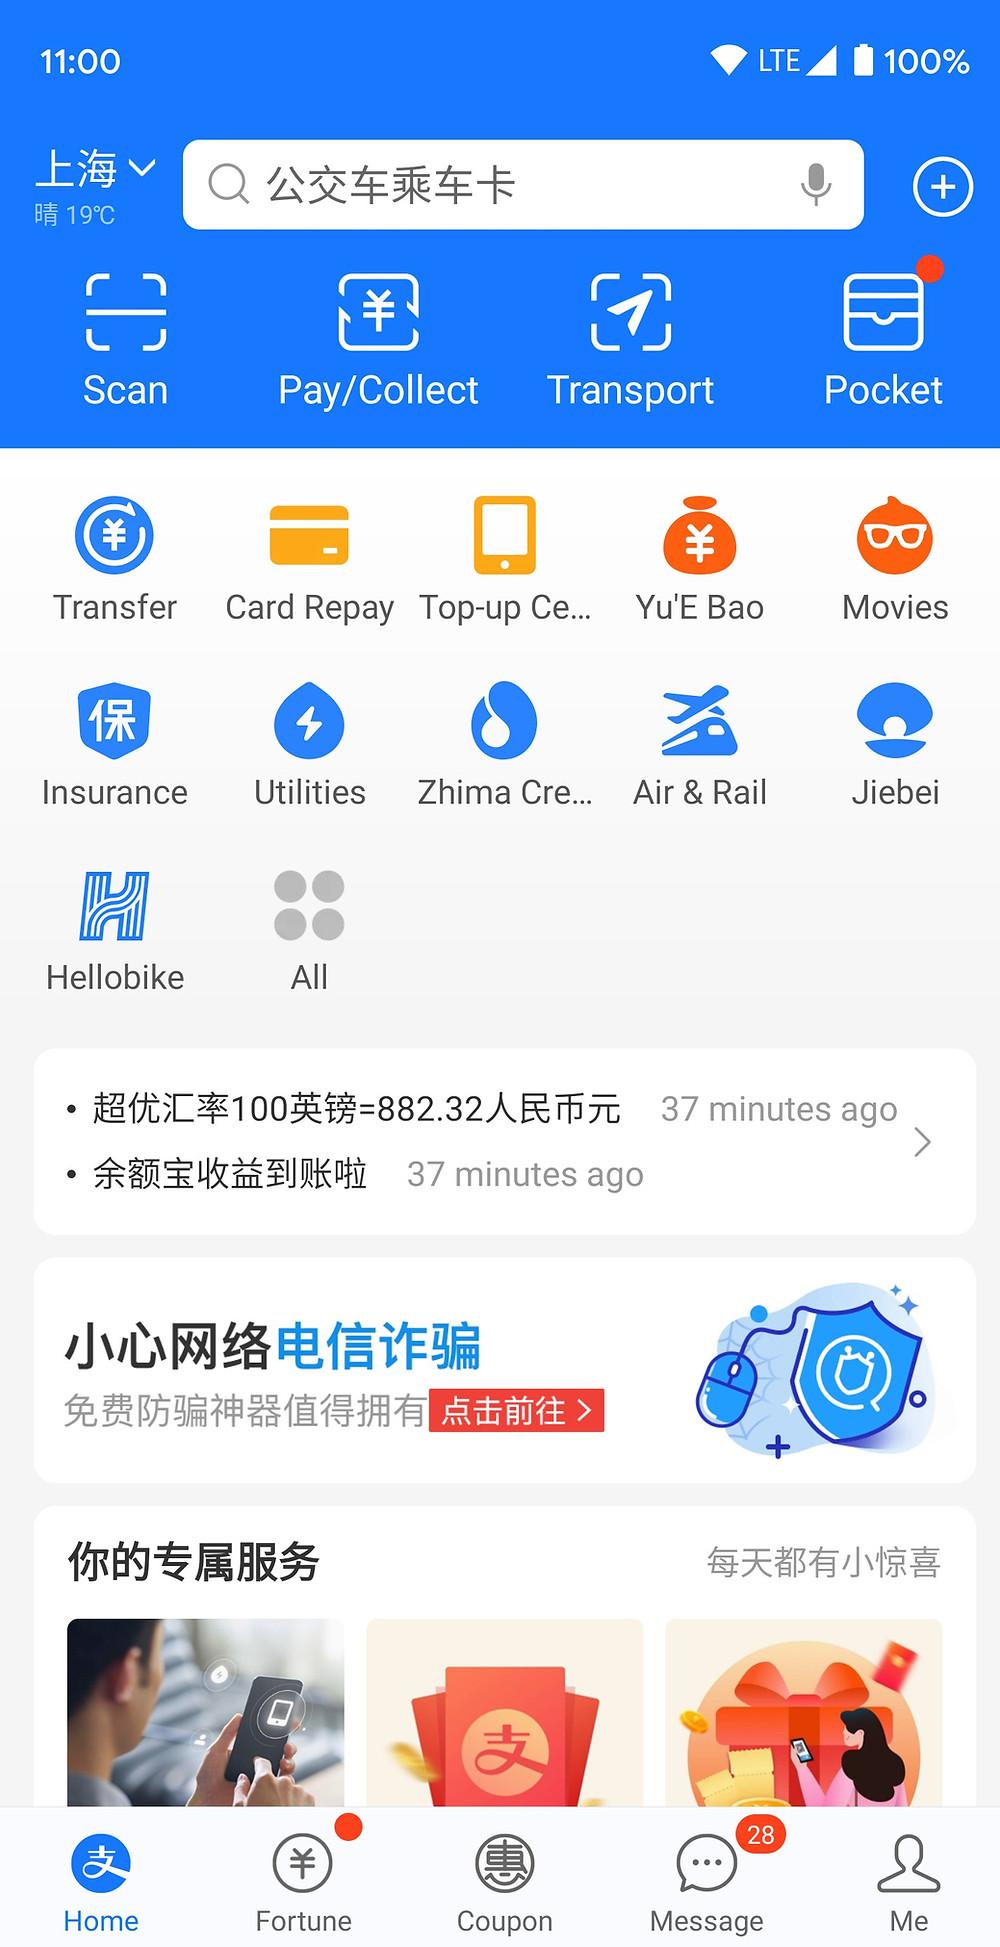 Alipay interface